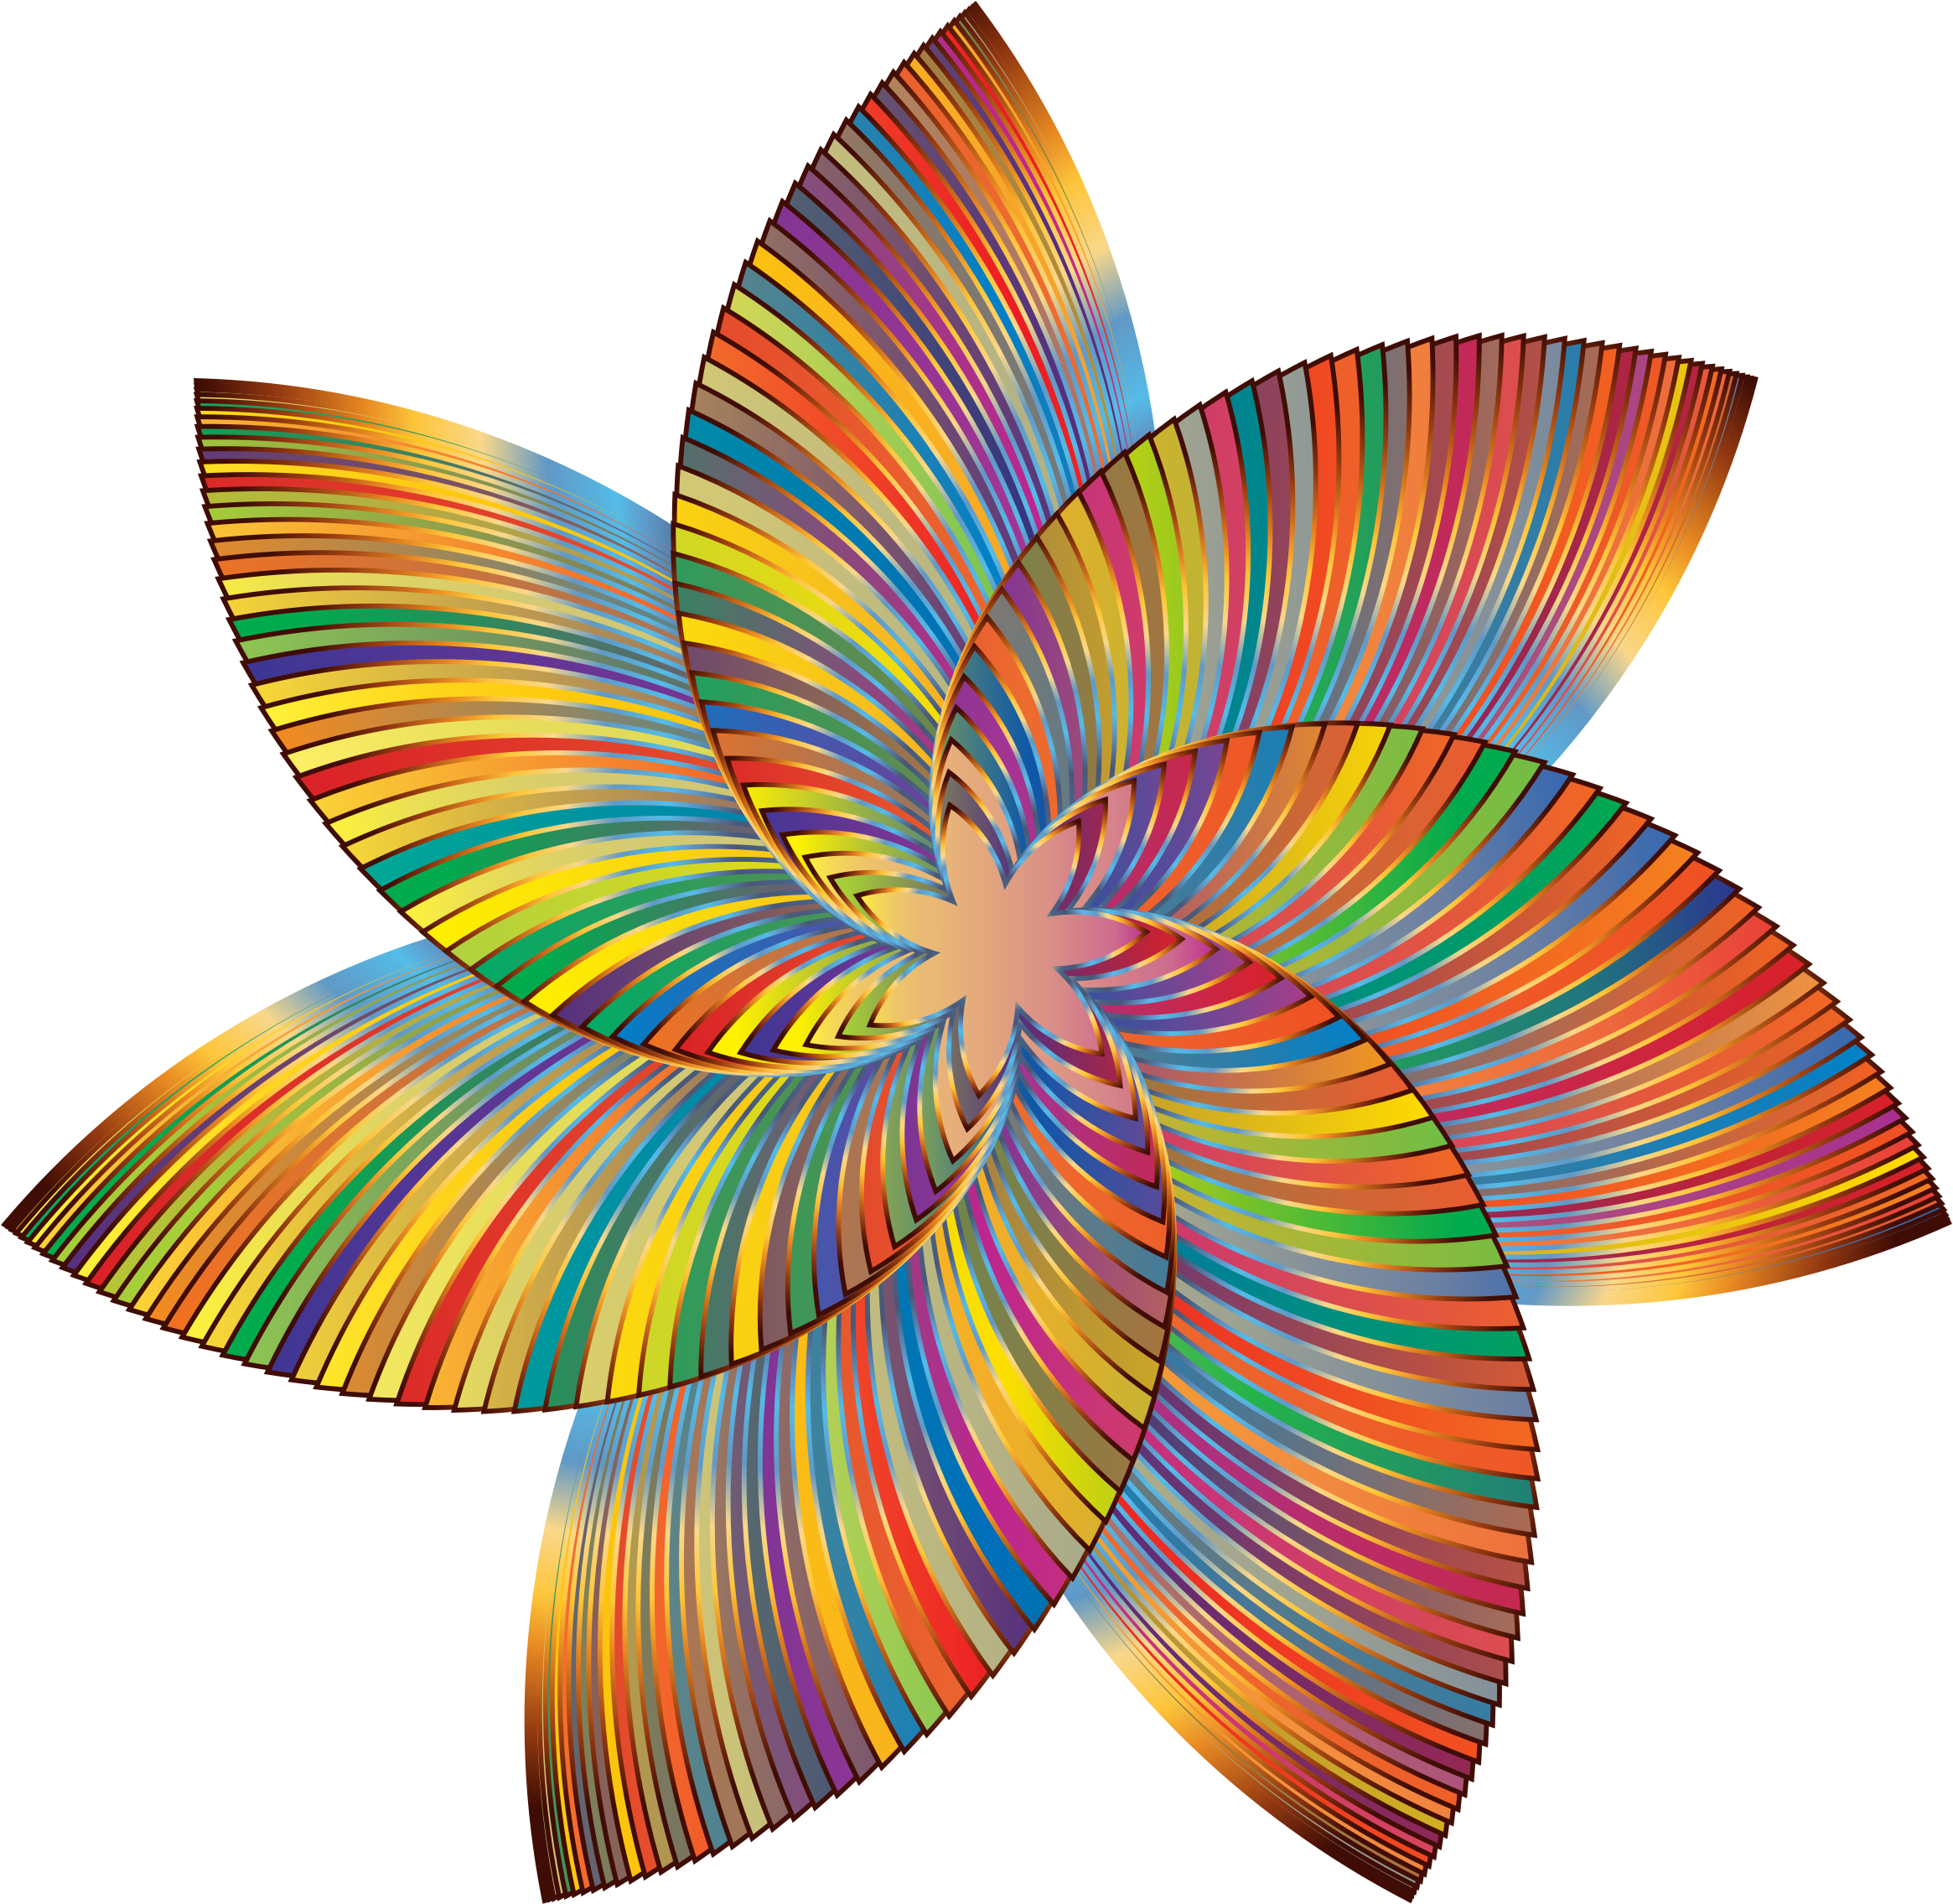 Colorful flower clipart jpg transparent download Clipart - Colorful Flower Line Art 2 jpg transparent download